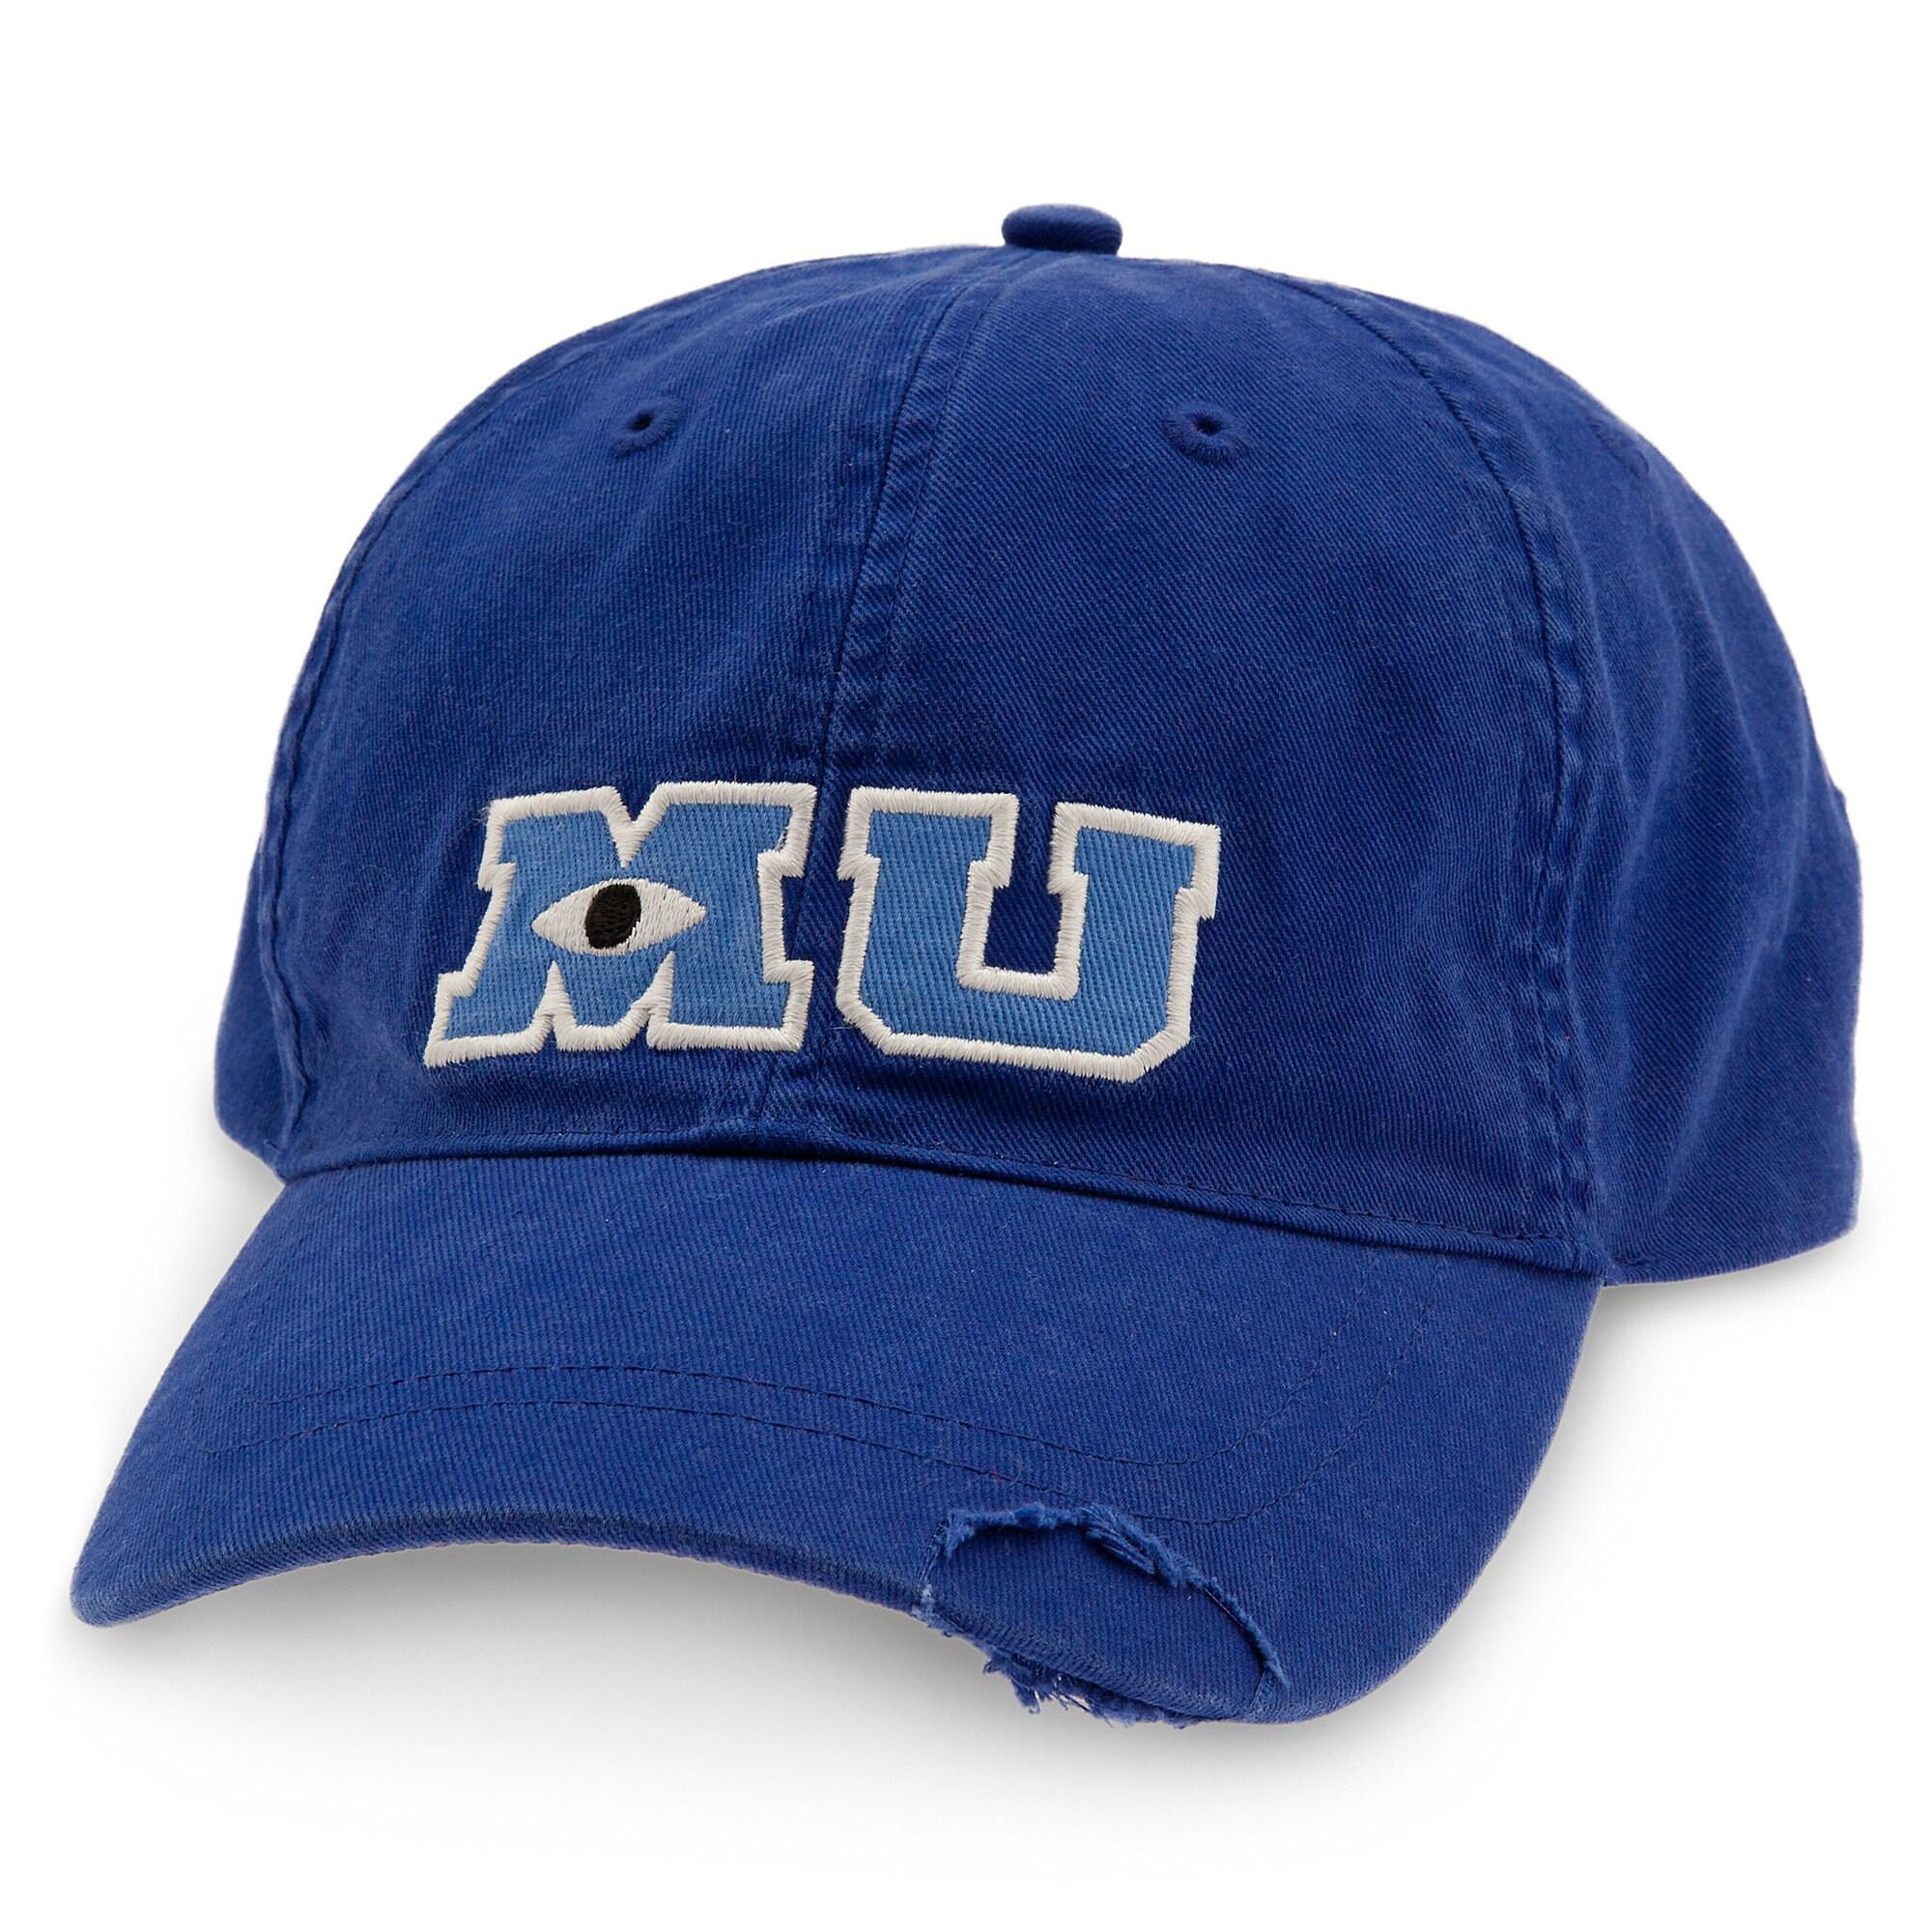 dc89147c88e39 Monsters University Baseball Cap for Adults